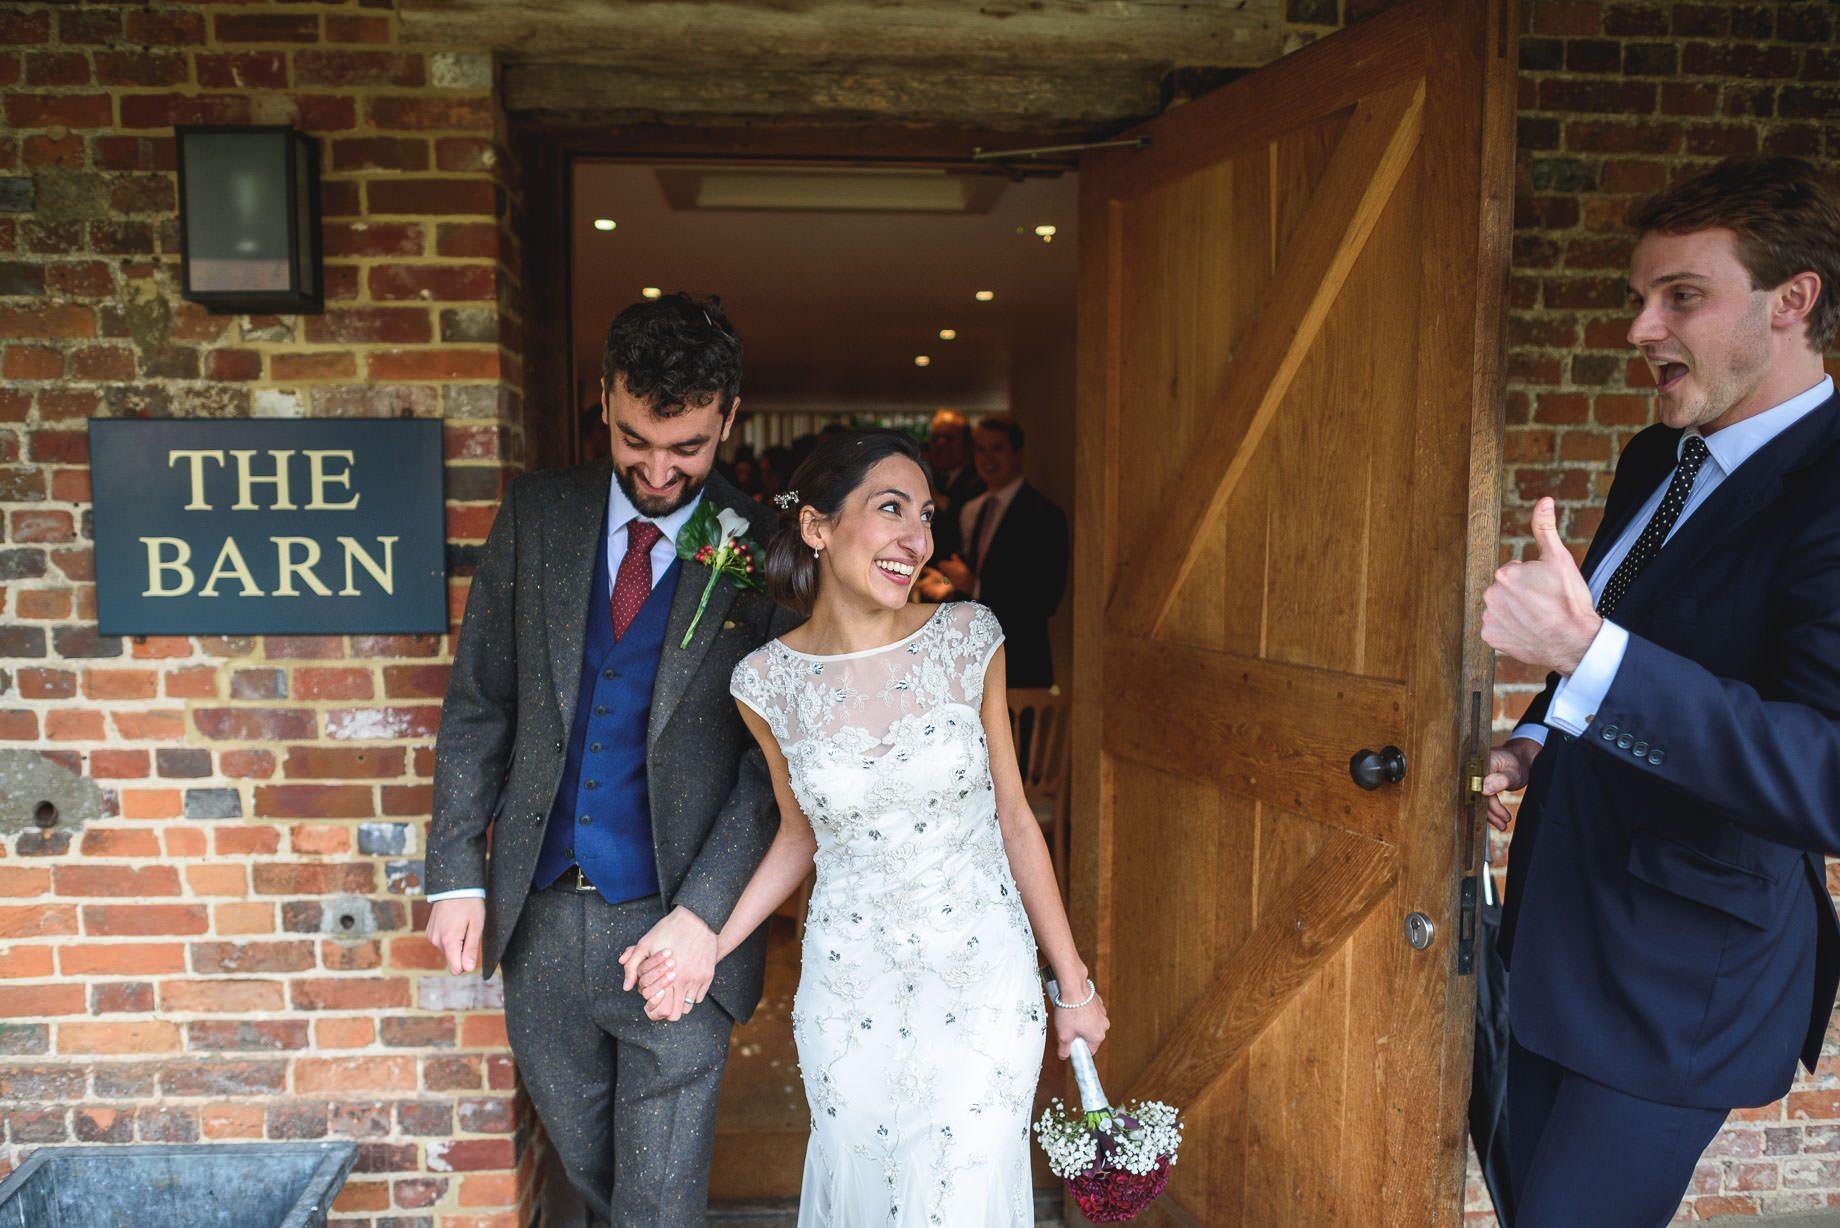 bury-court-barn-wedding-photography-guy-collier-photography-nadia-tom-68-of-184